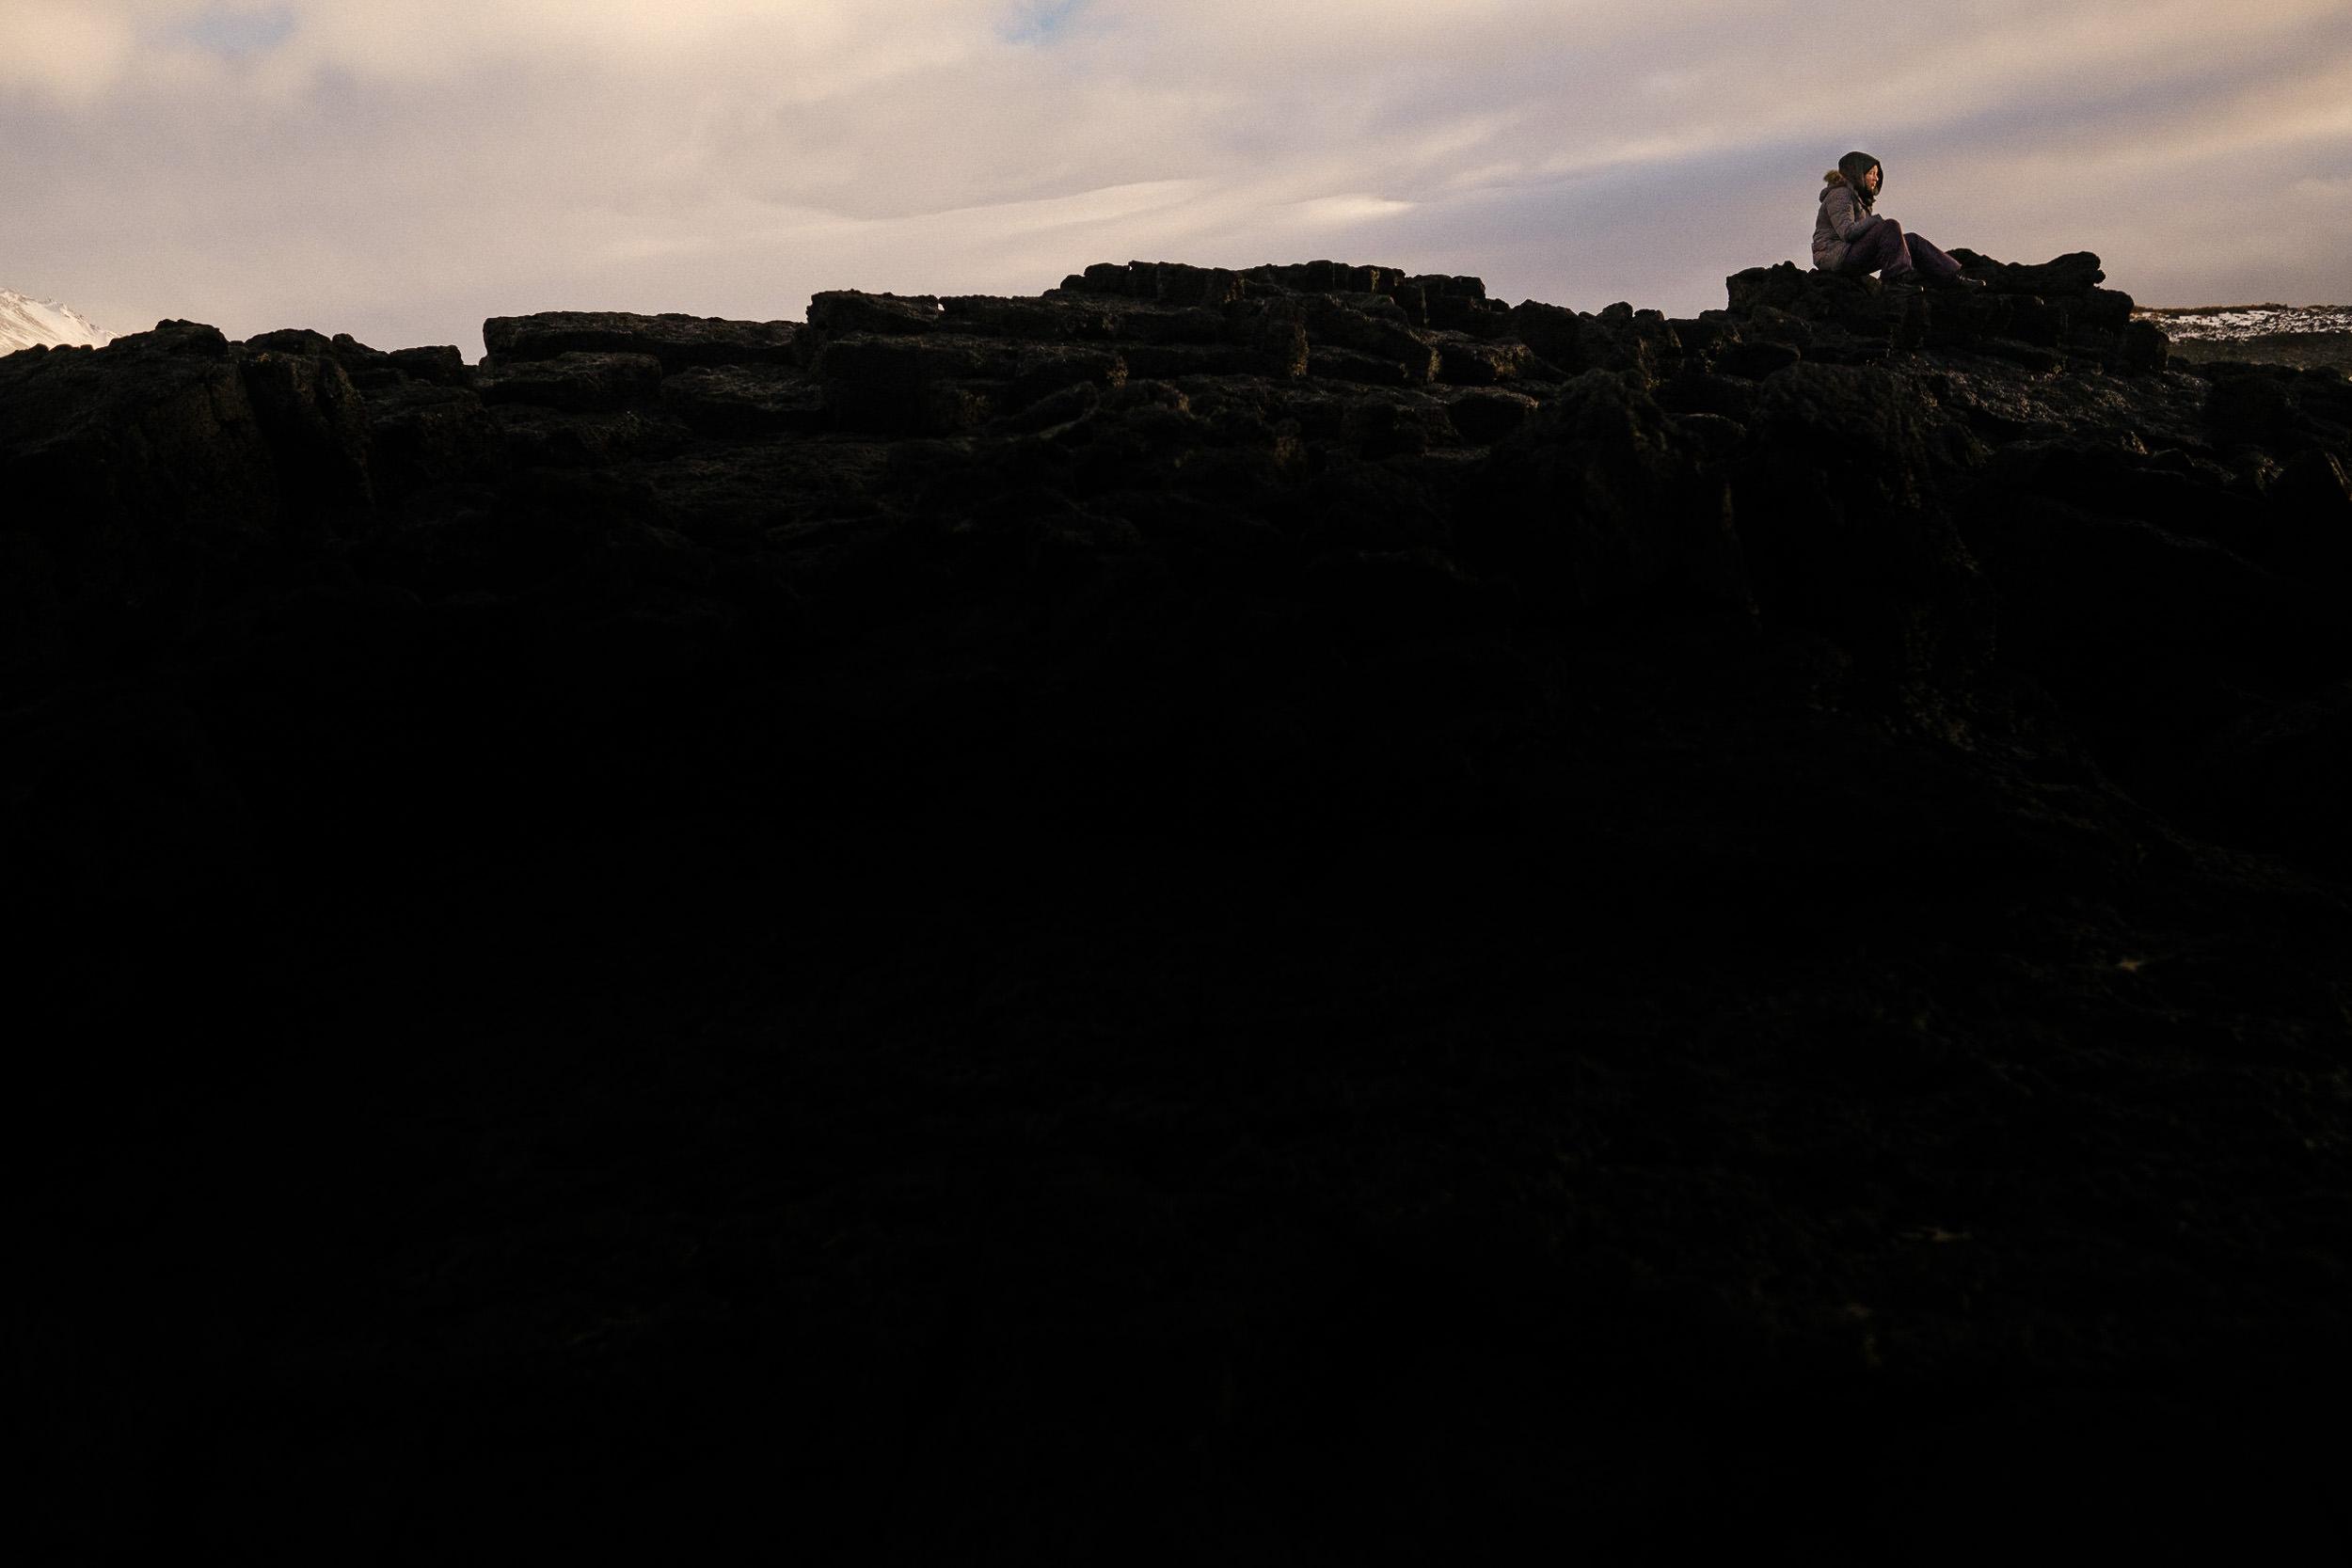 Collective_Wander_Iceland_Photographers_Trip_032.jpg